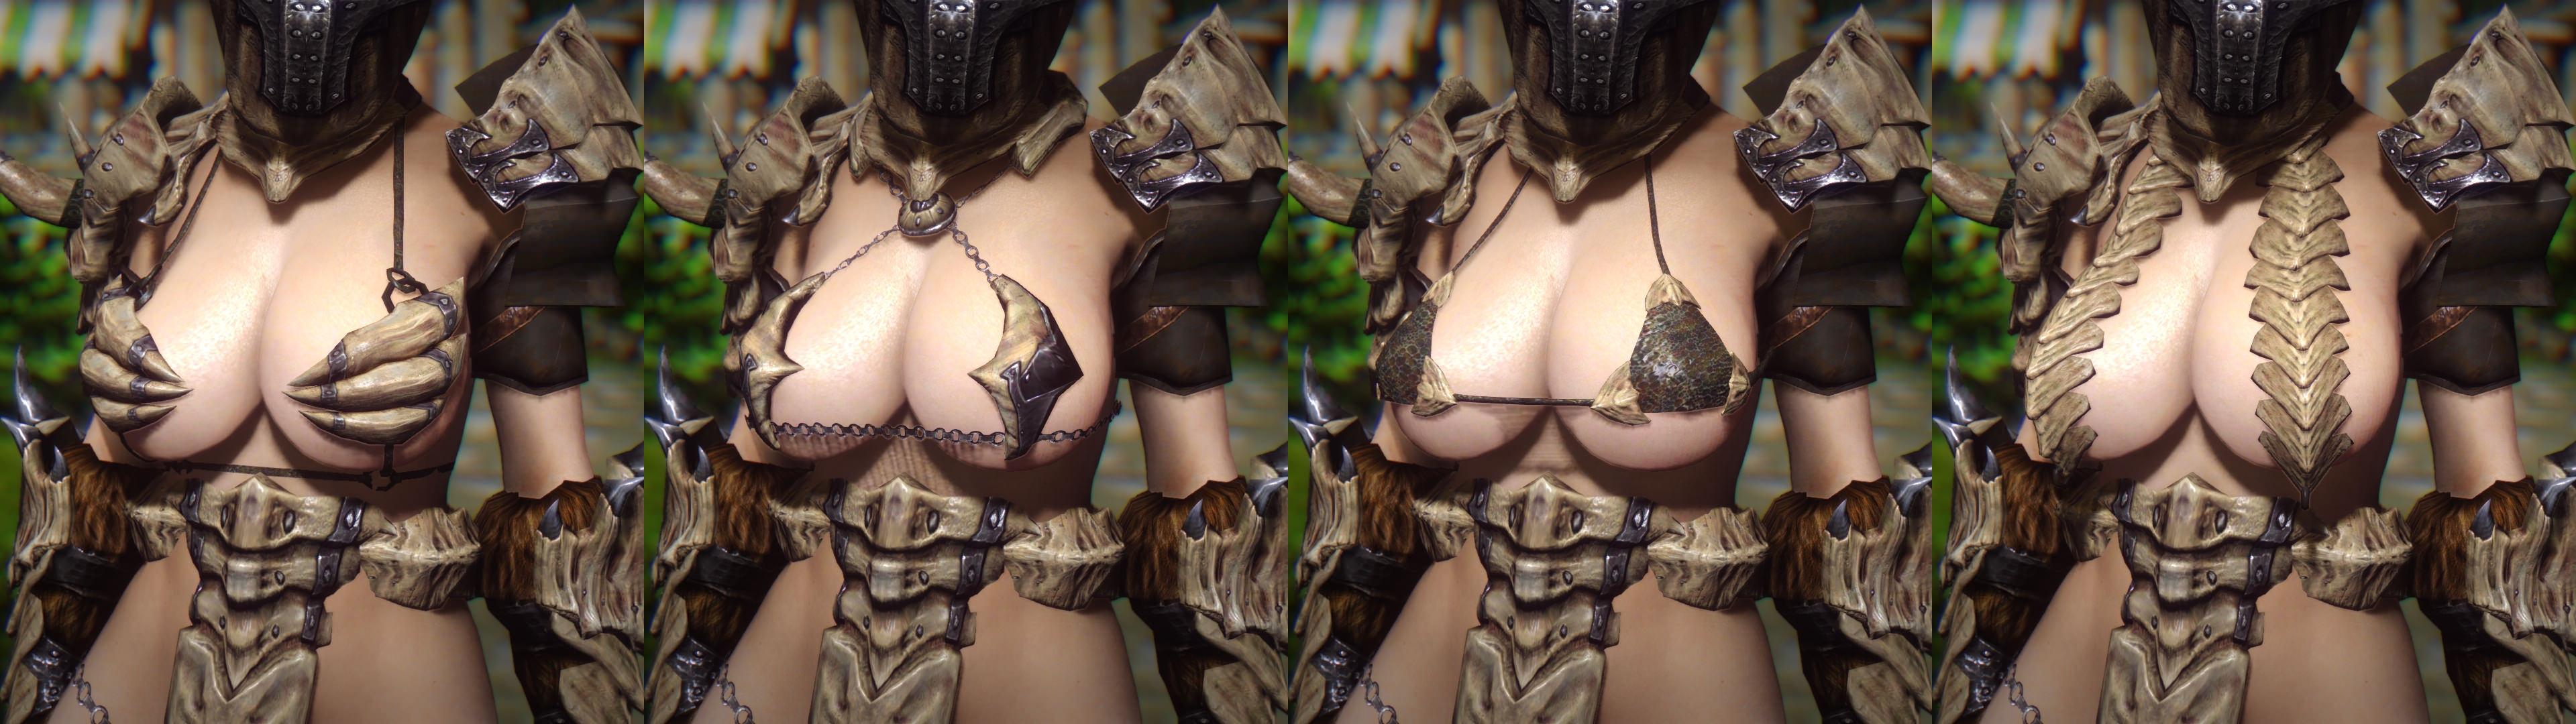 Dragon_Bone_Bikini_Armor_10.jpg